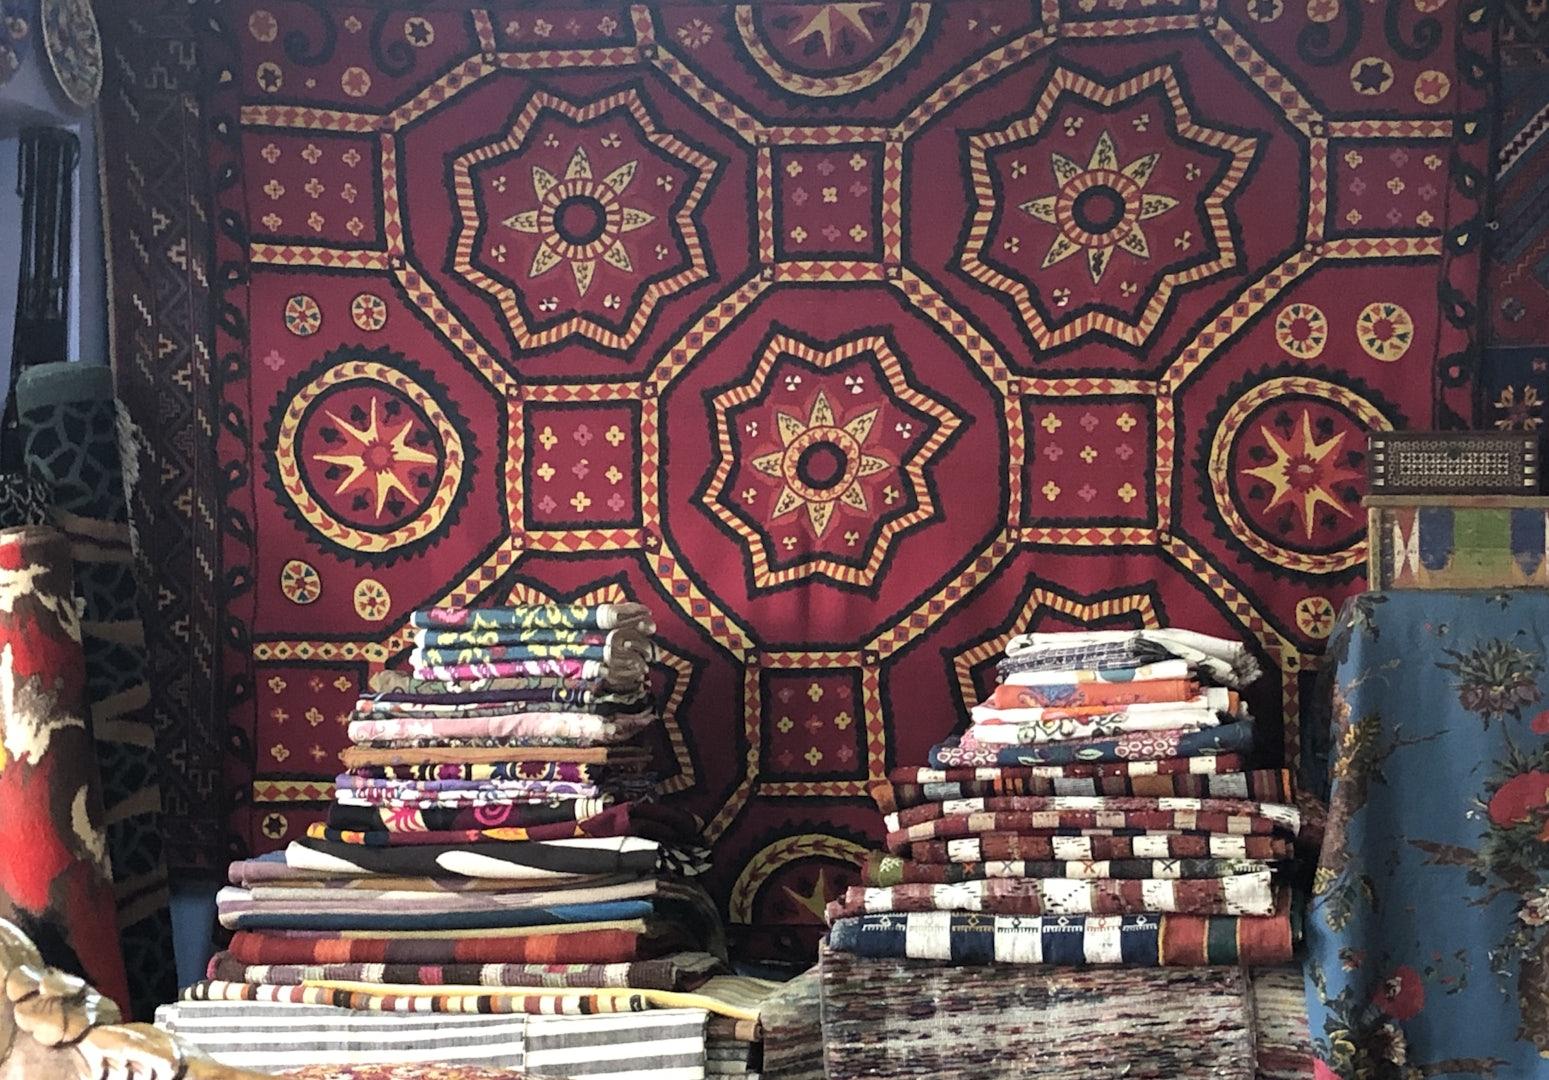 turkish textiles with detailed design at Karavan Istanbul